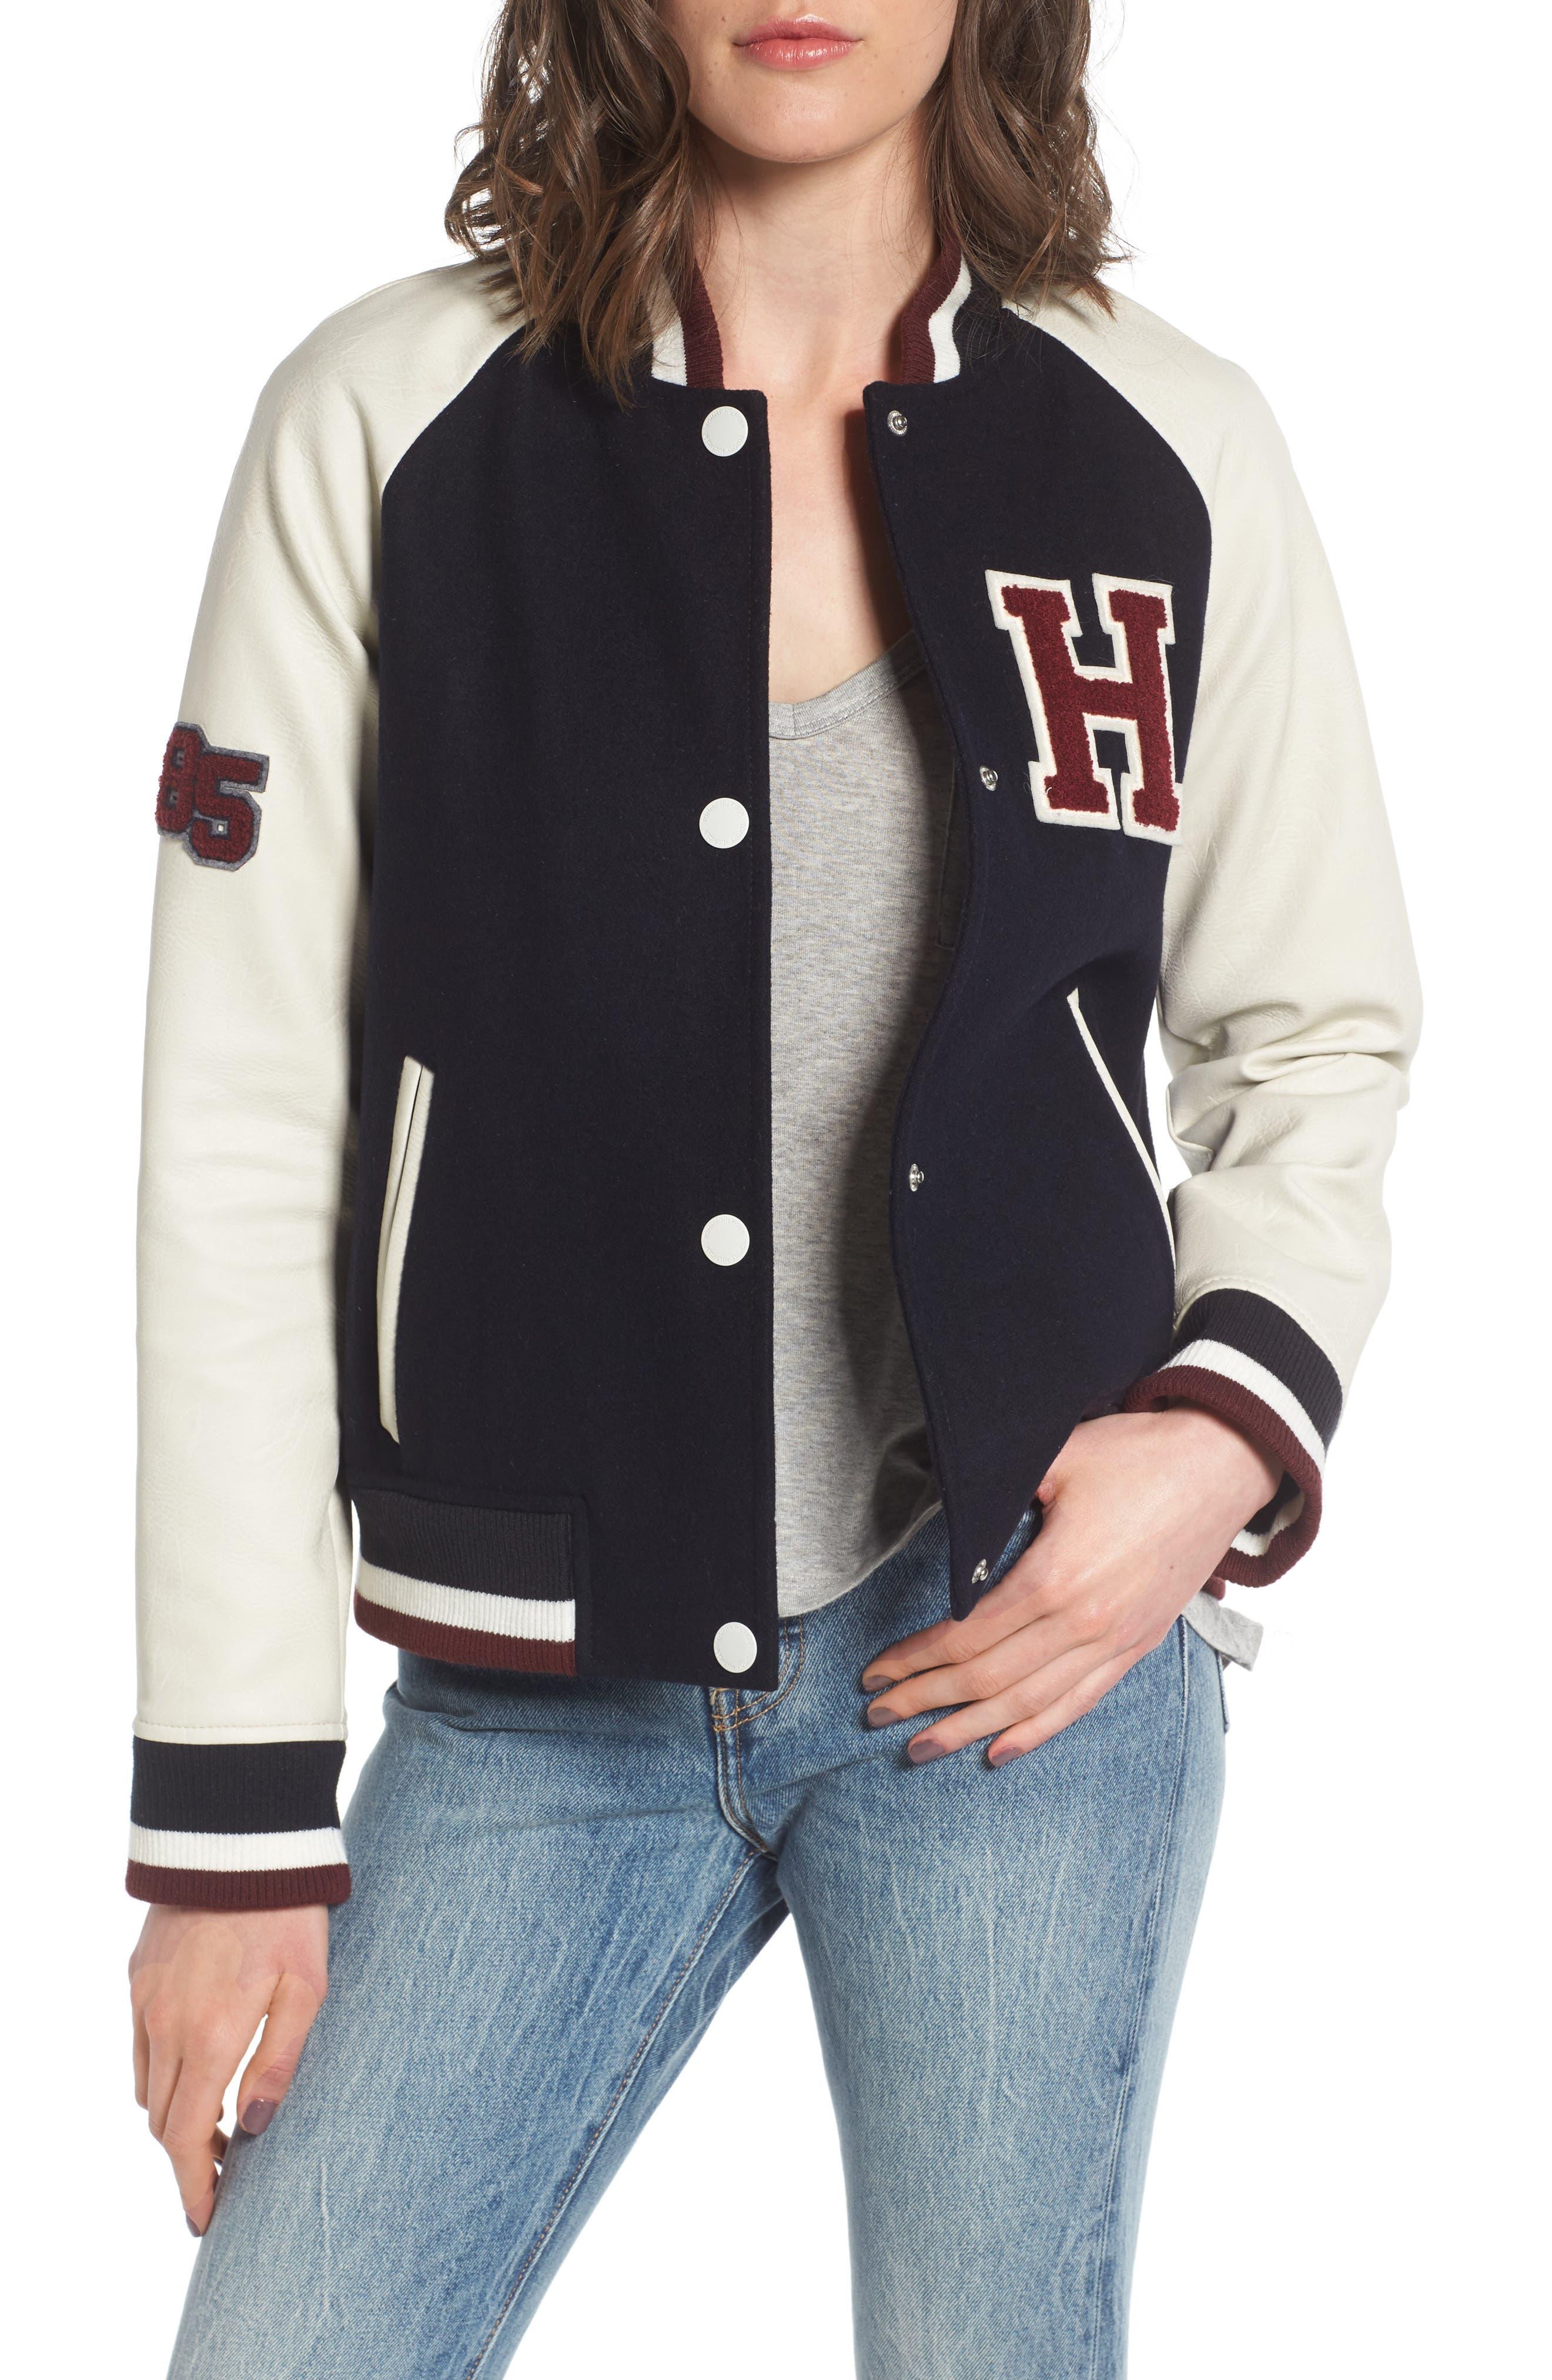 Alternate Image 1 Selected - Tommy Hilfiger Mixed Media Varsity Jacket